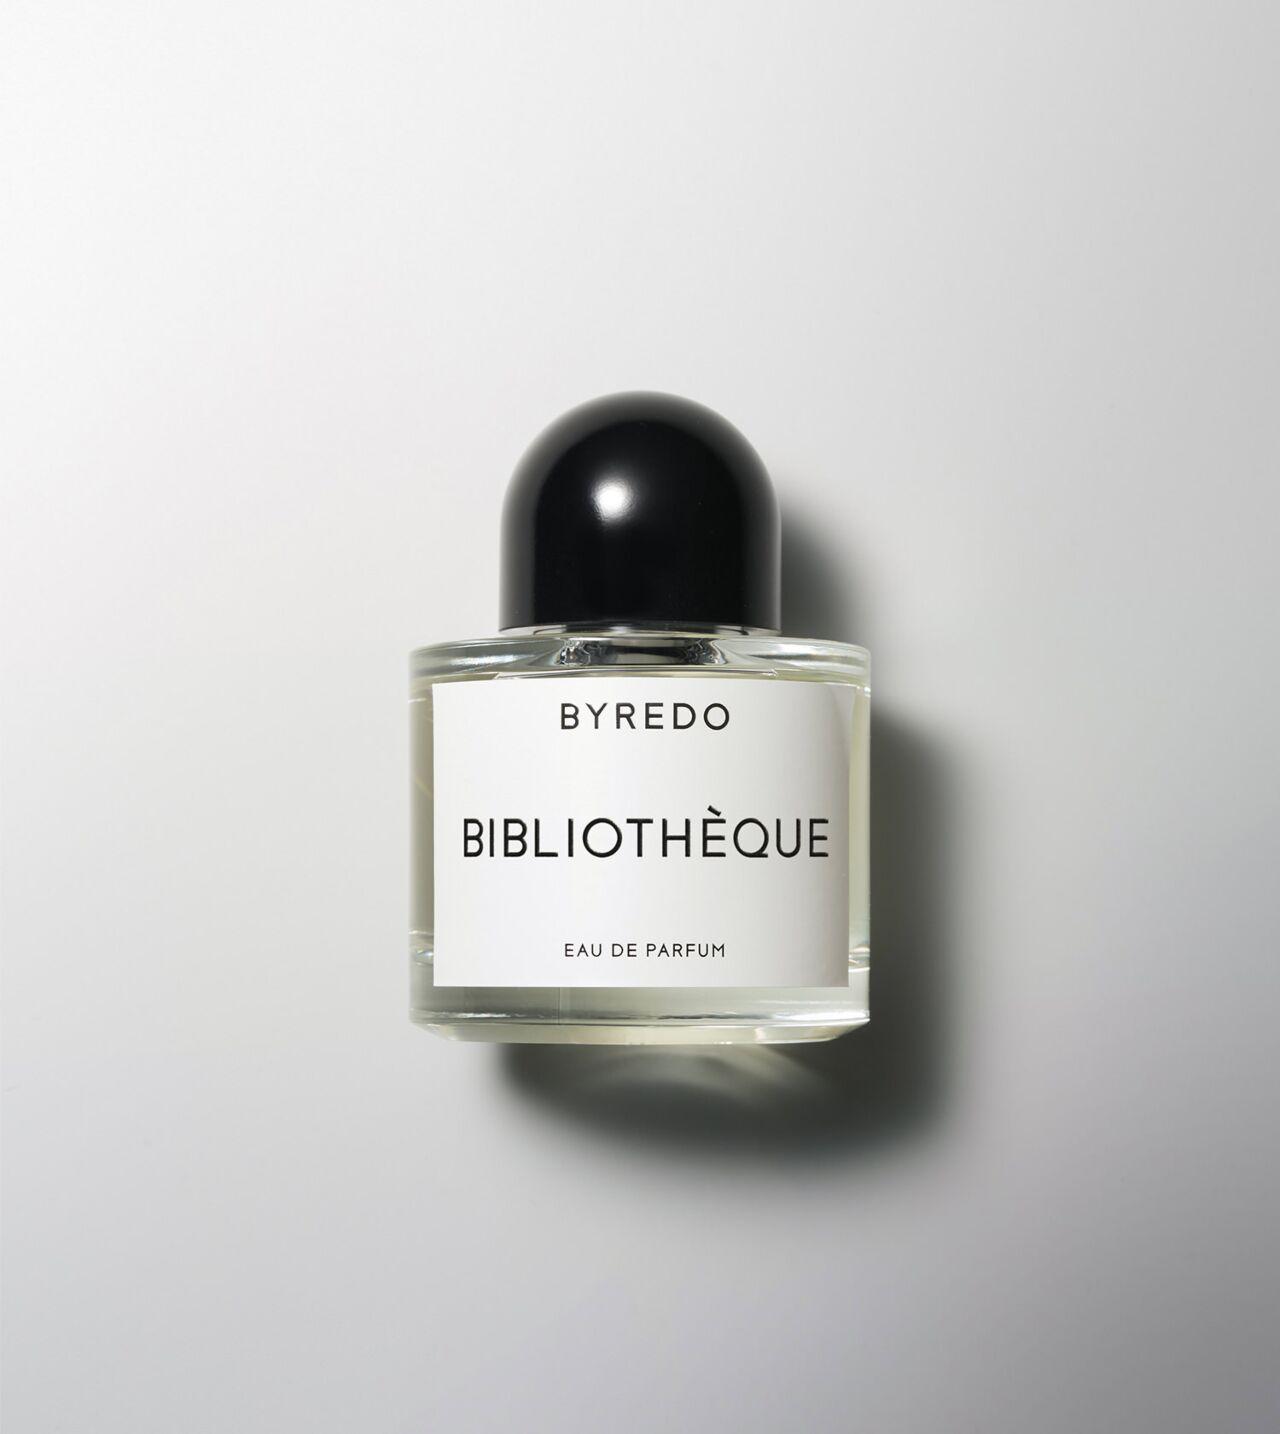 Picture of Byredo Bibliotheque Eau de Parfum 50ml